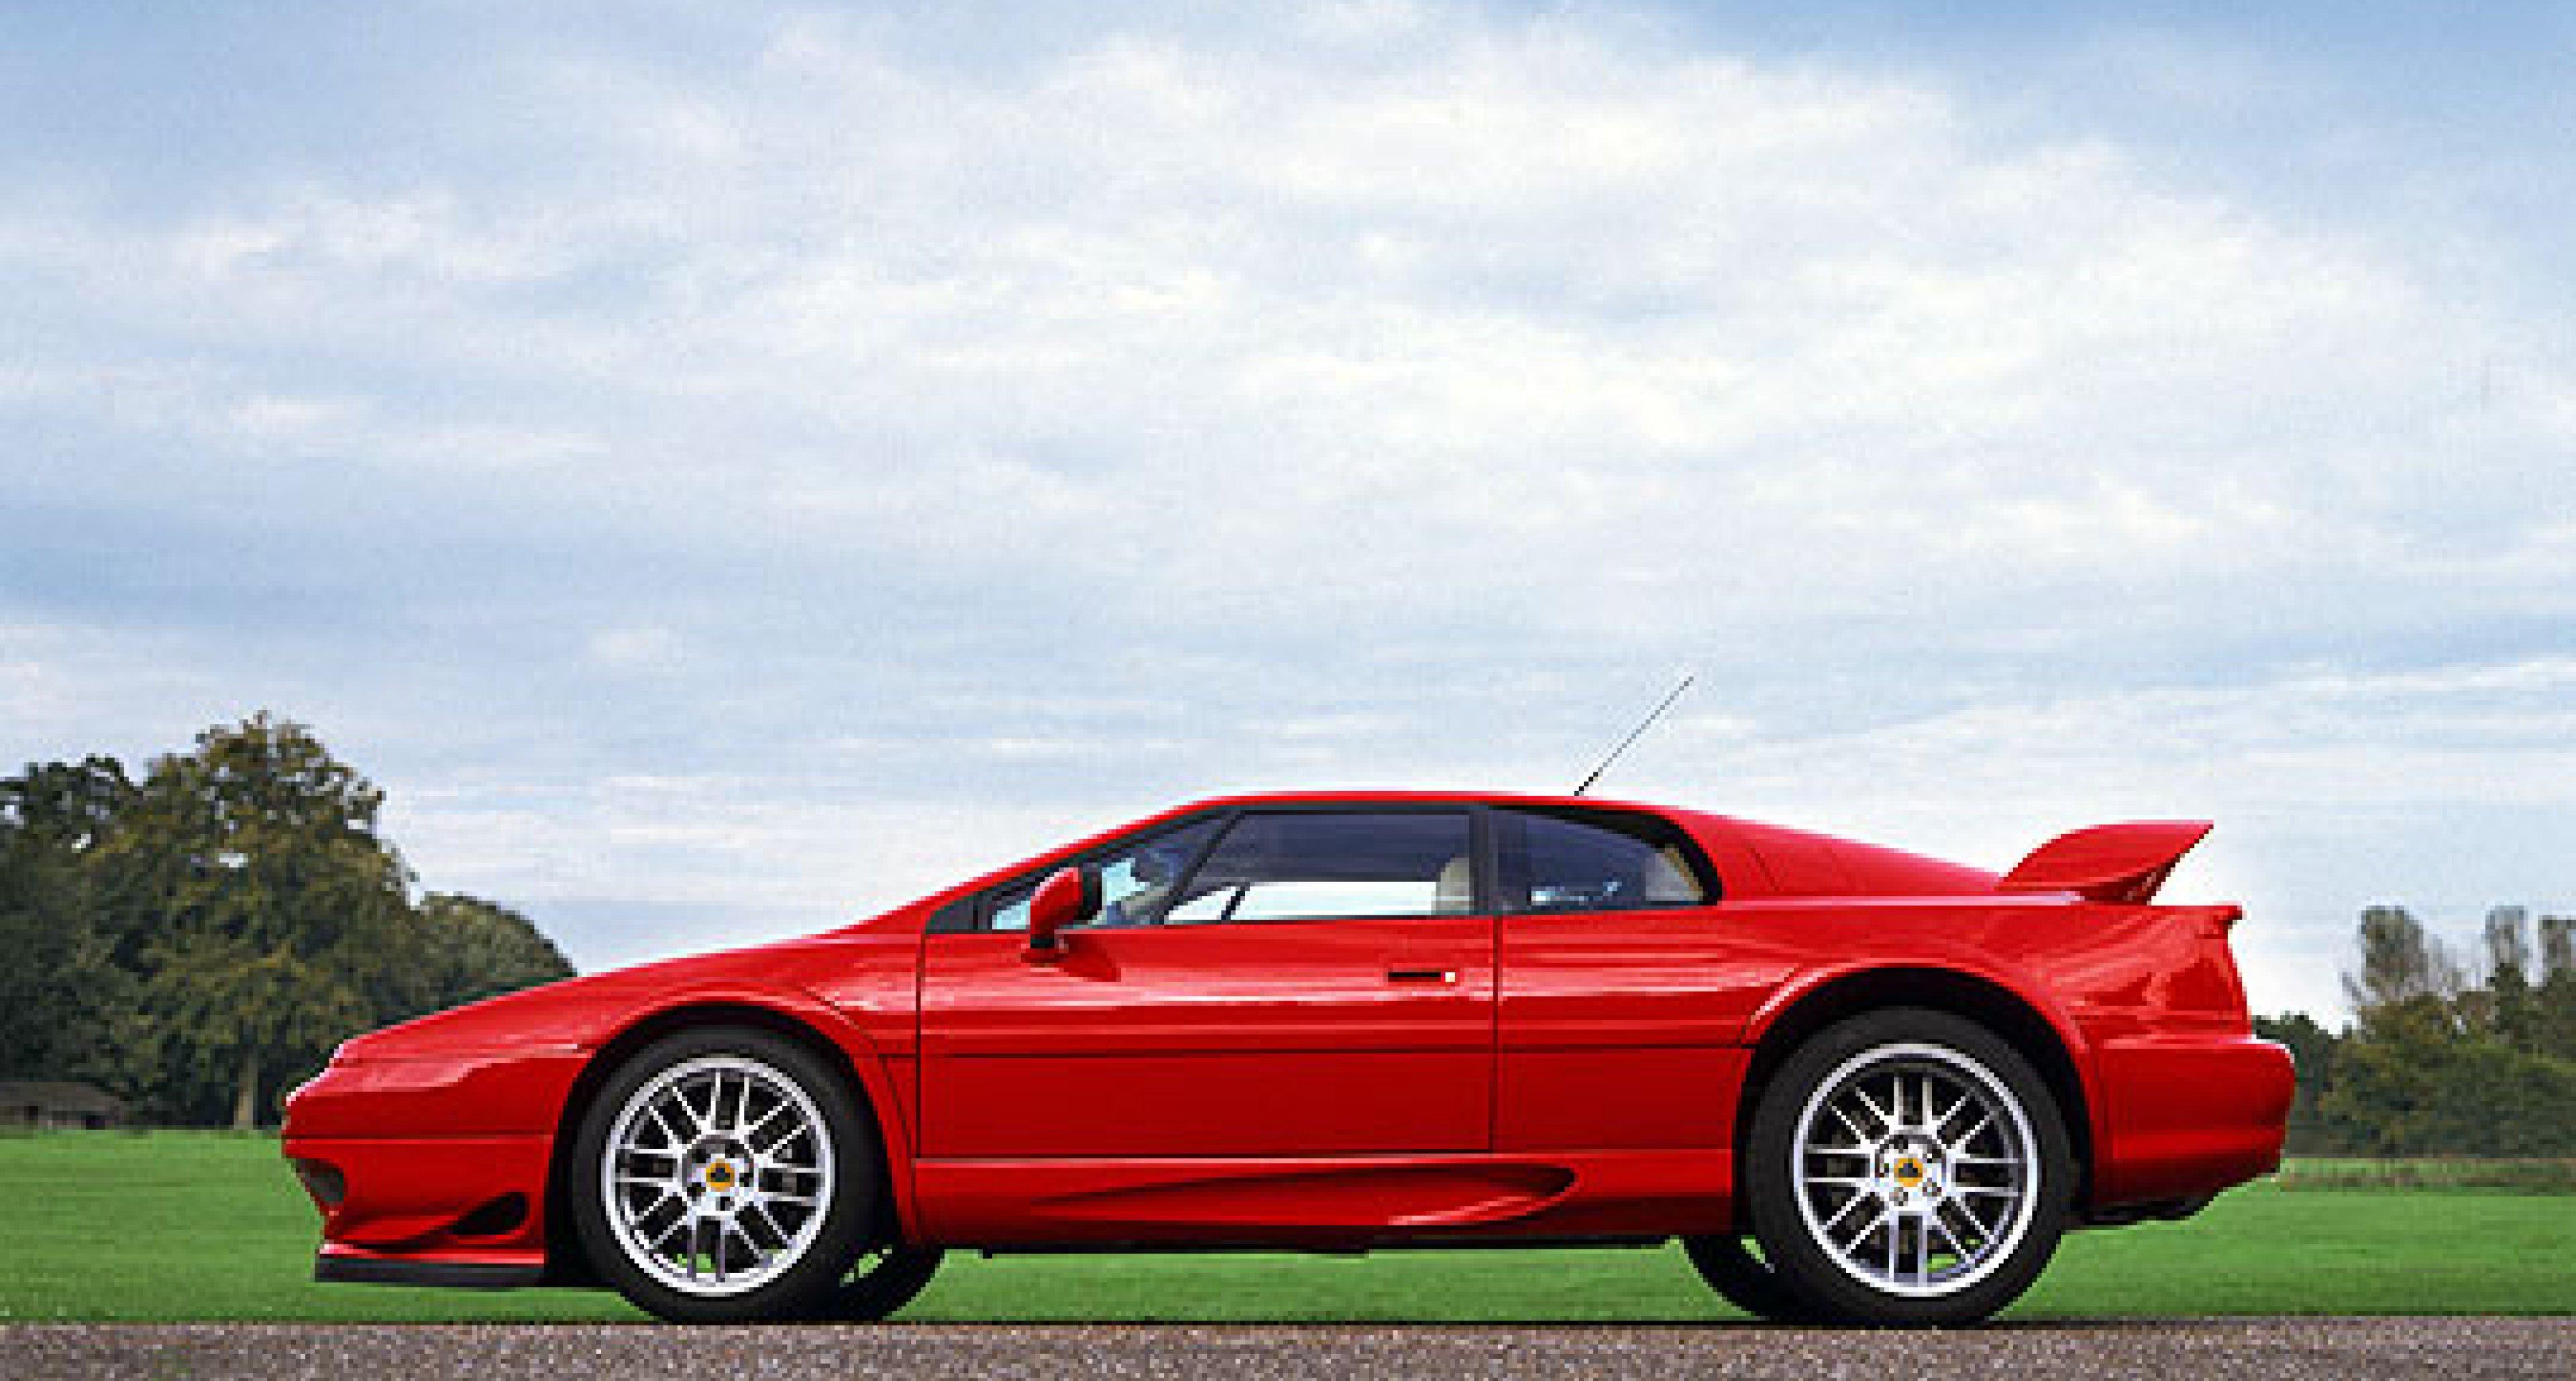 Made in England: Lotus Esprit